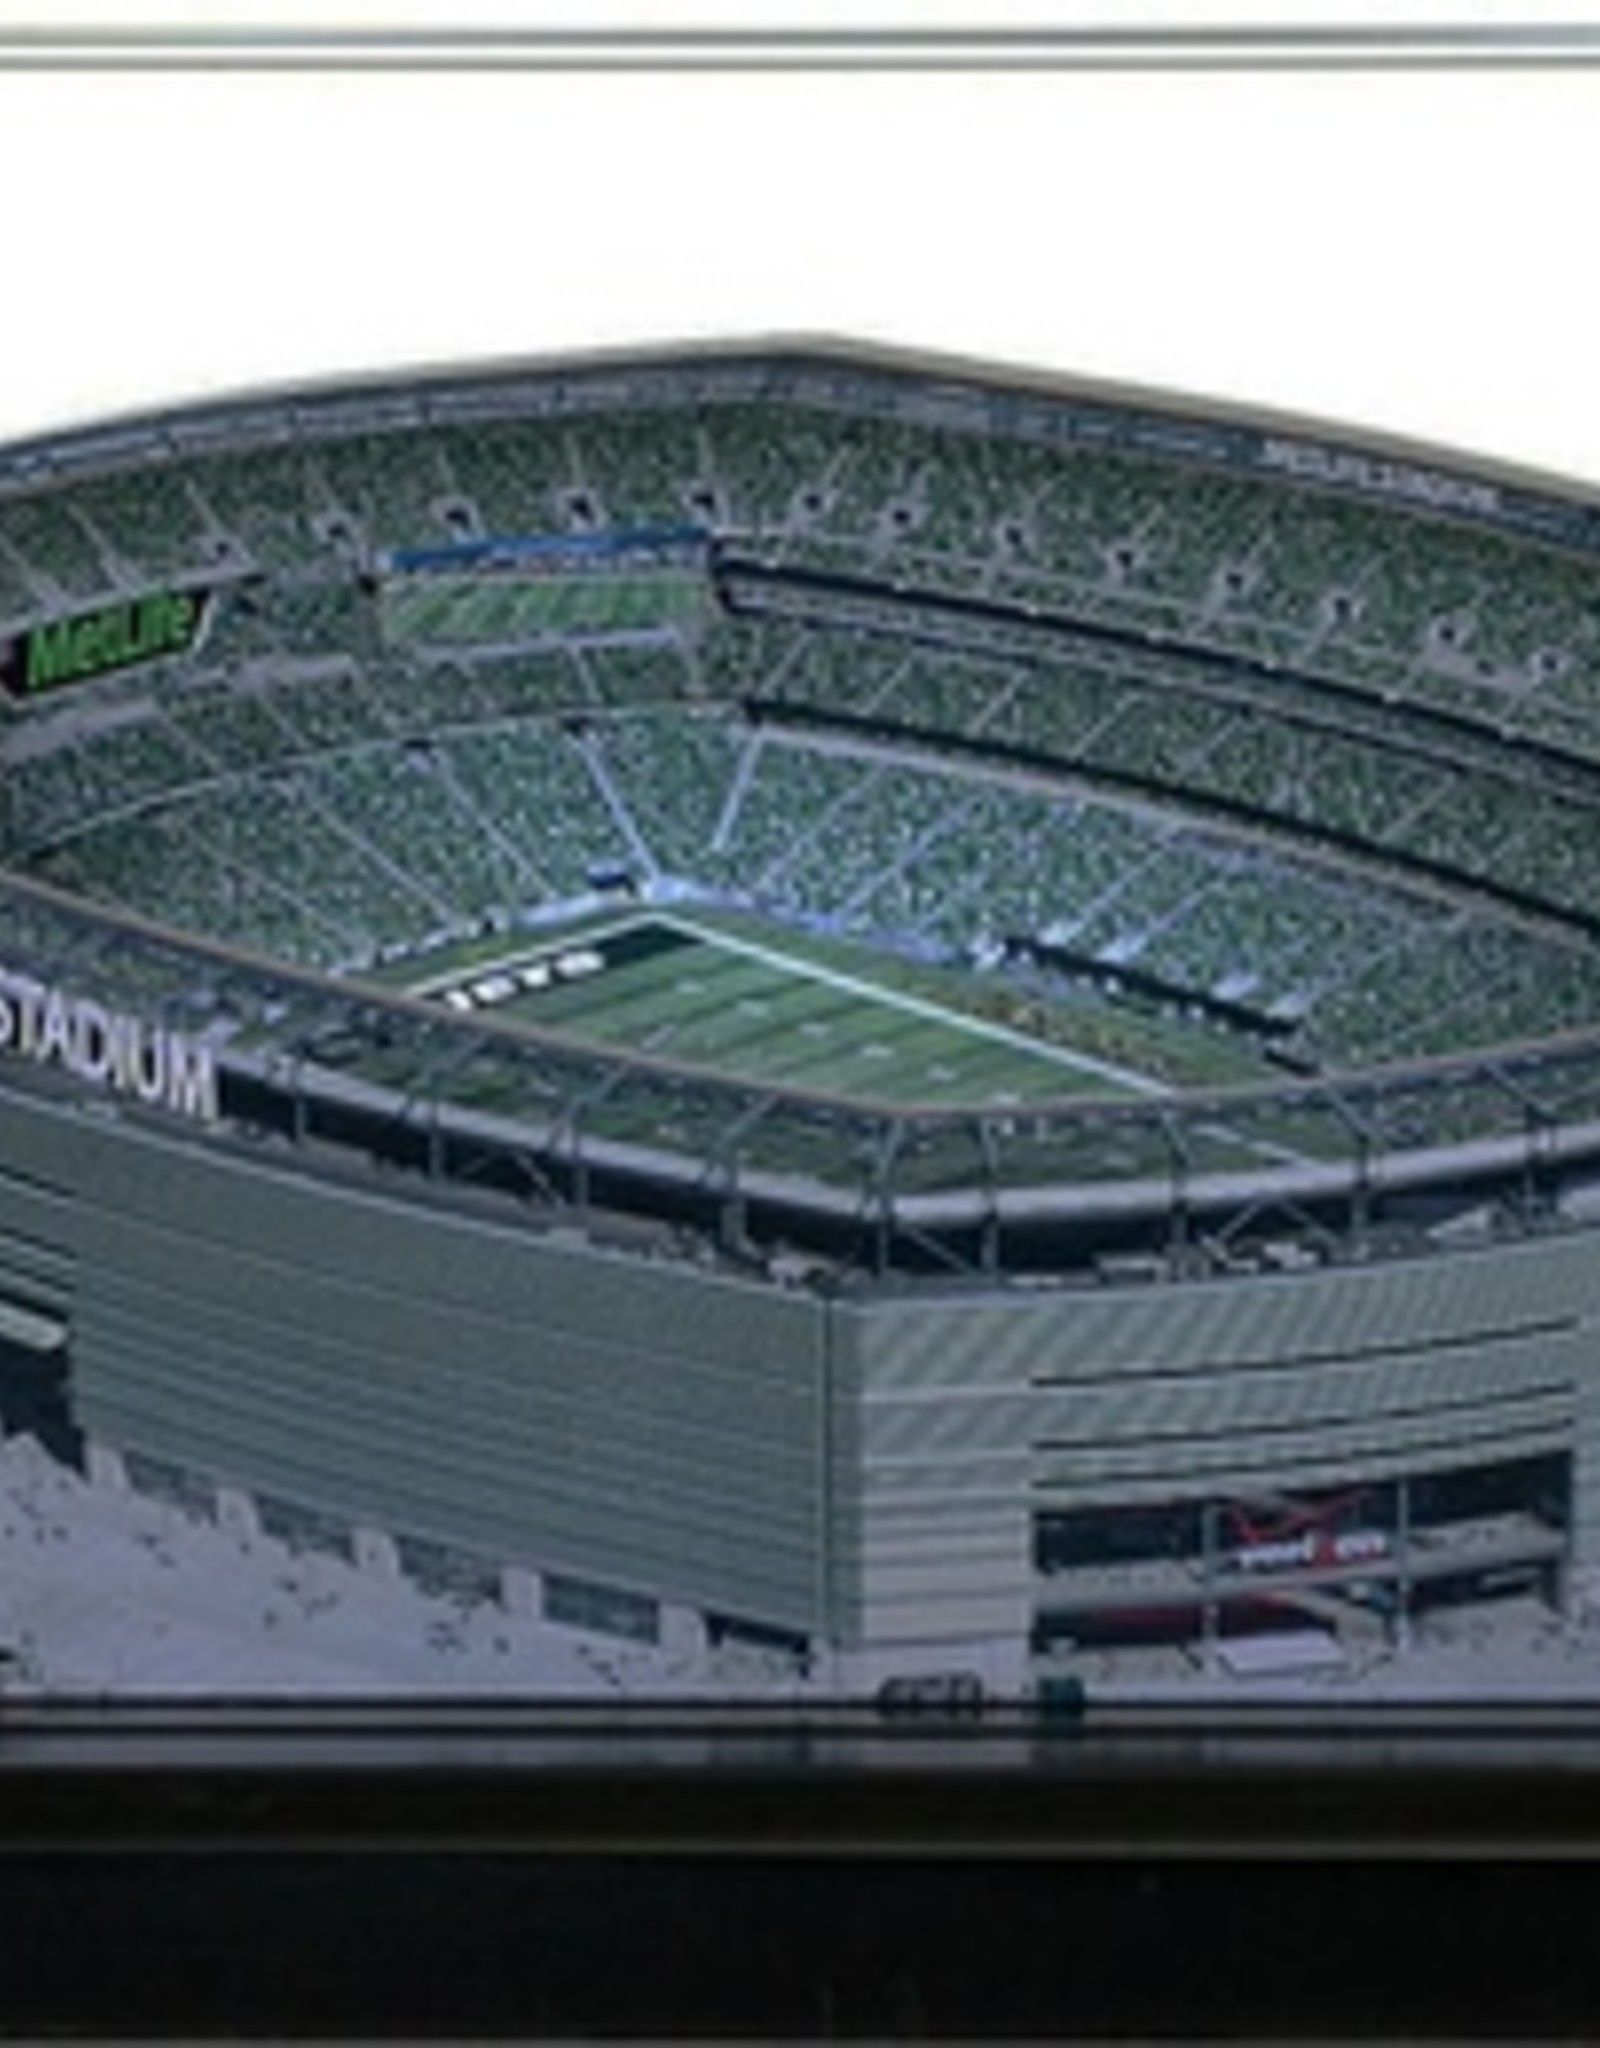 HOMEFIELDS New York Jets 19IN Lighted Replica Metlife Stadium